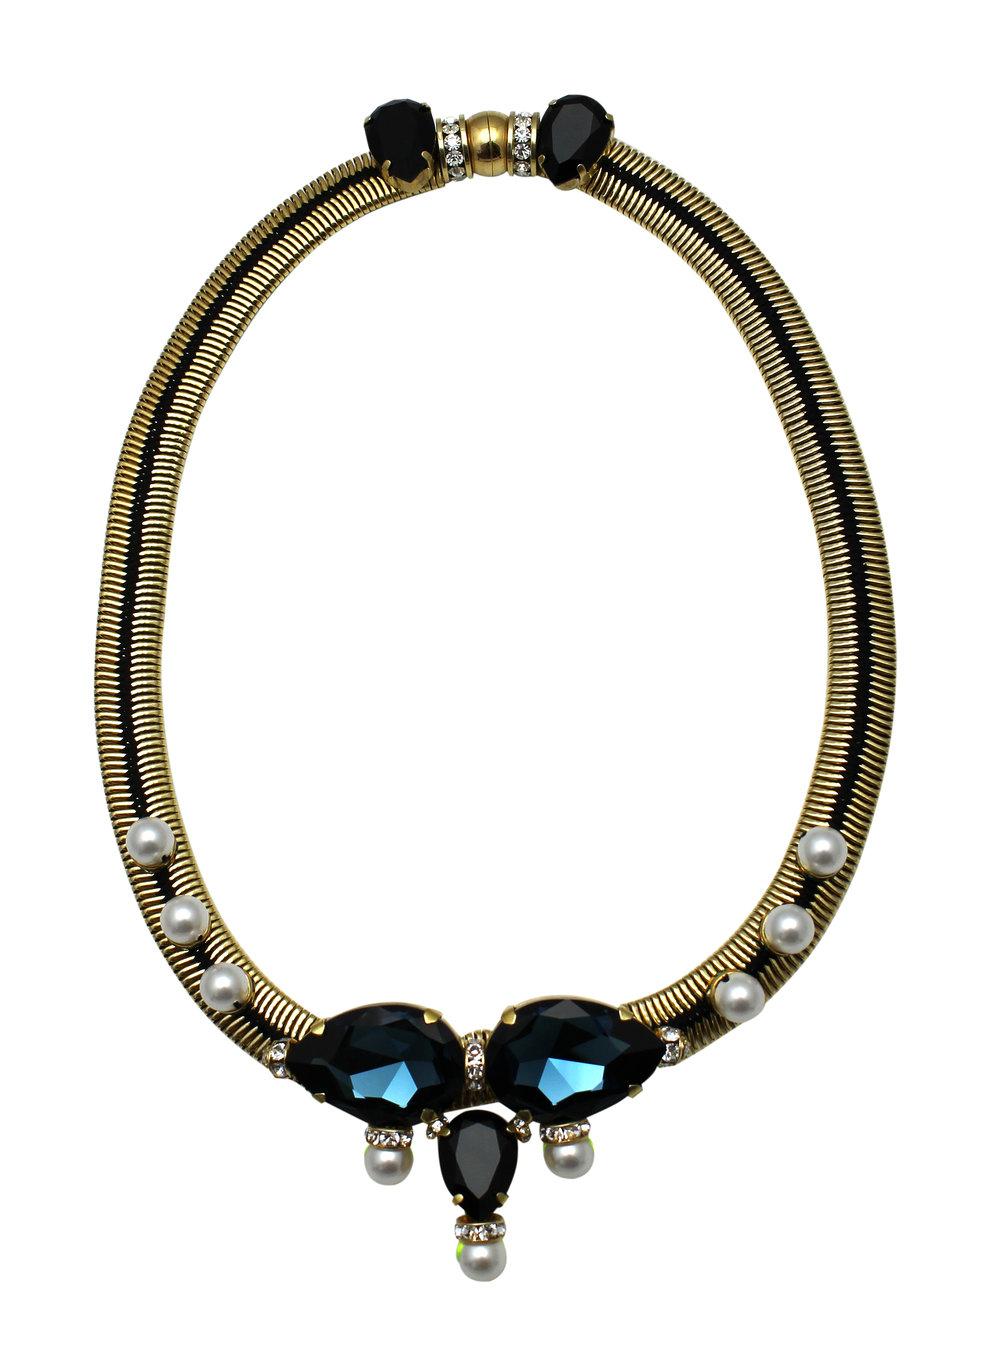 172N Monaco Necklace.jpg